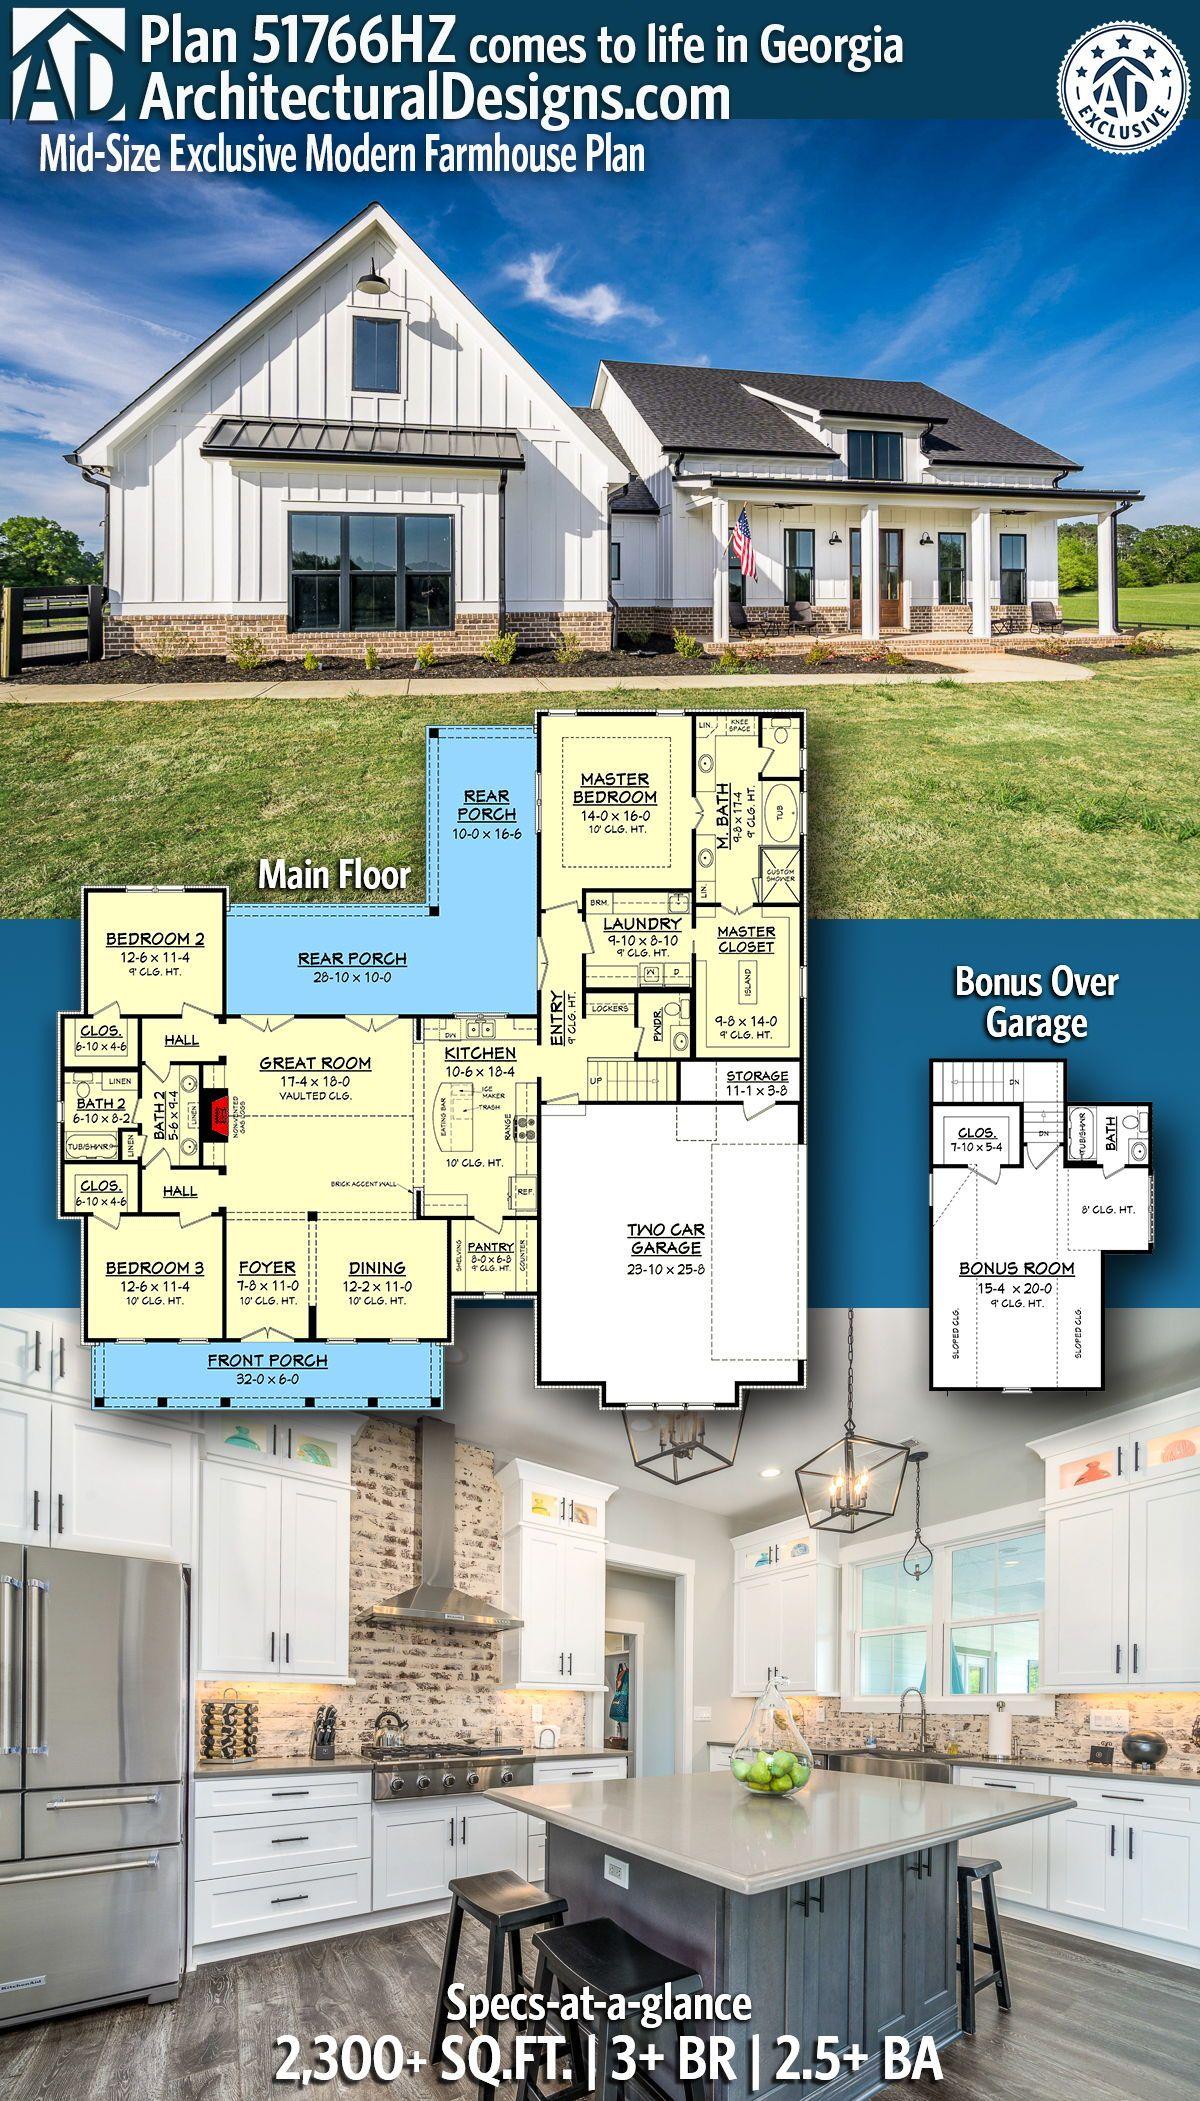 Plan 51766HZ MidSize Exclusive Modern Farmhouse Plan in